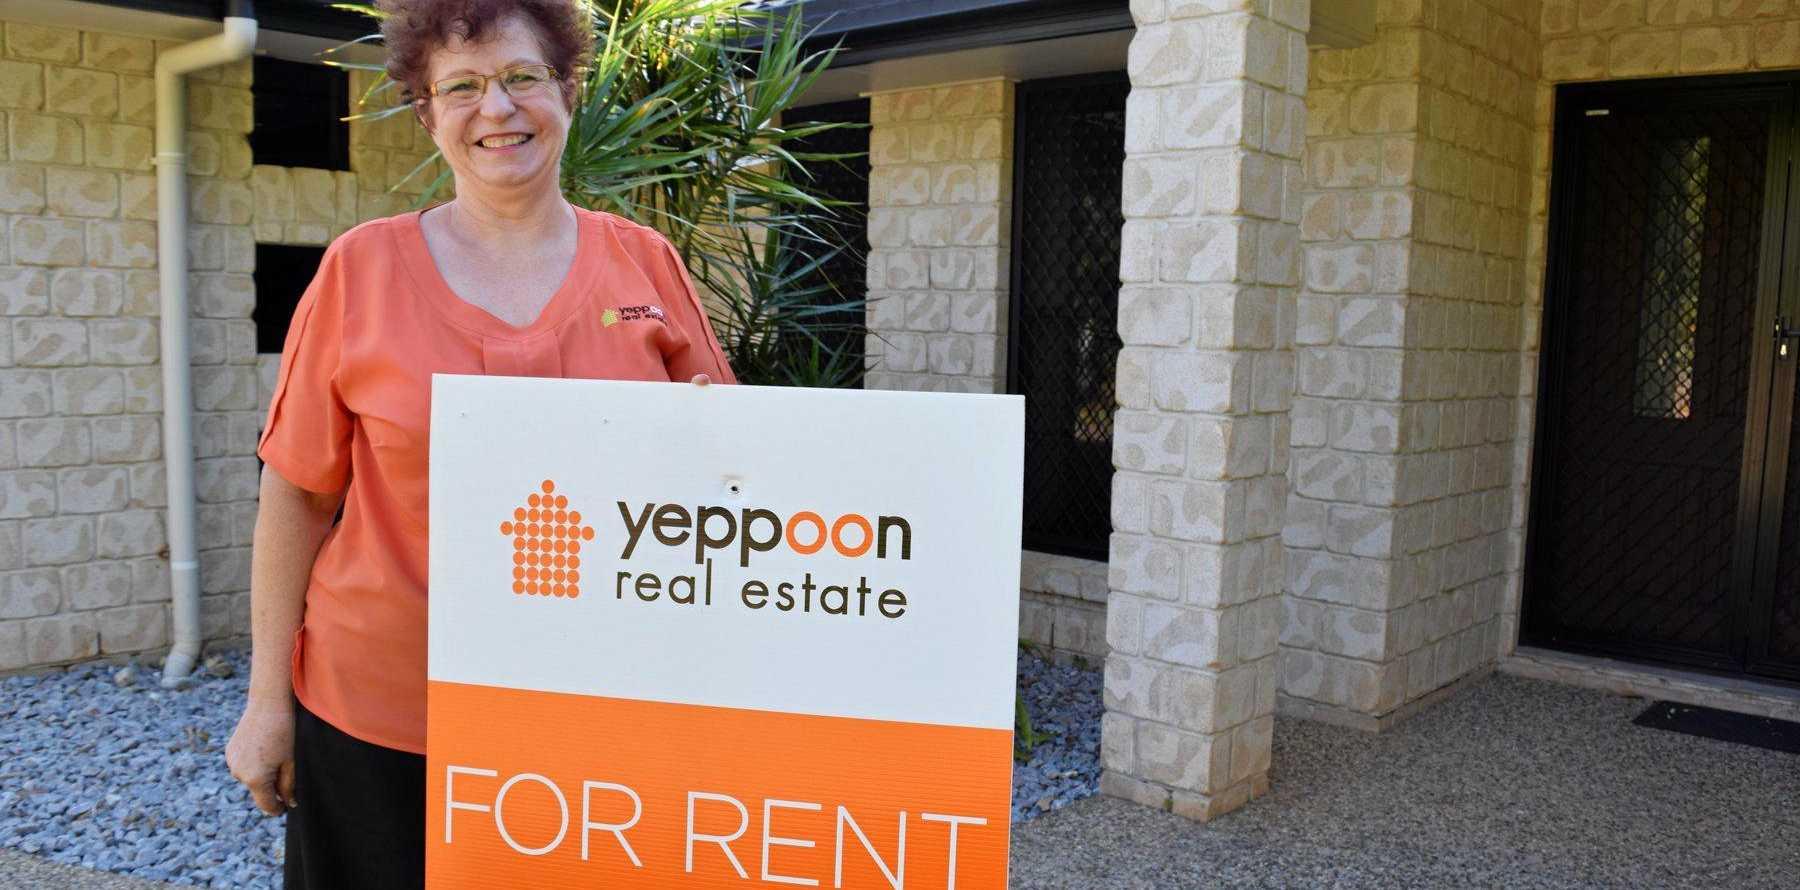 Yeppoon Real Estate principal and owner Esme Coren at one of their rental properties in Yeppoon.